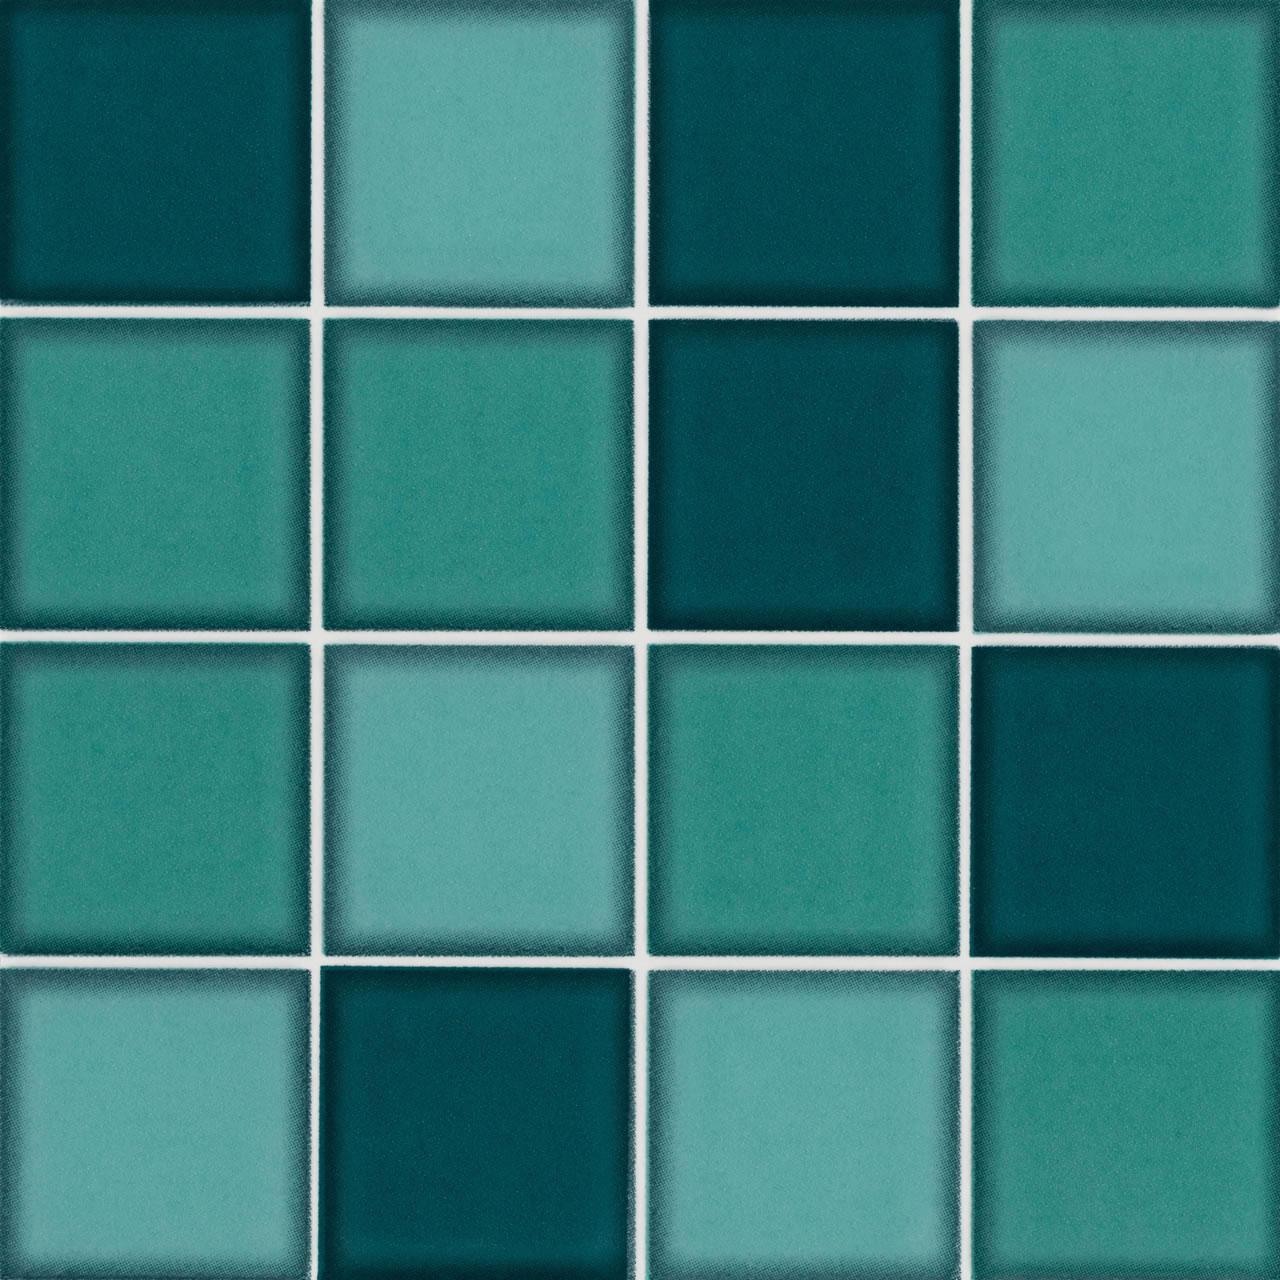 colorbox maxi verde 19×19